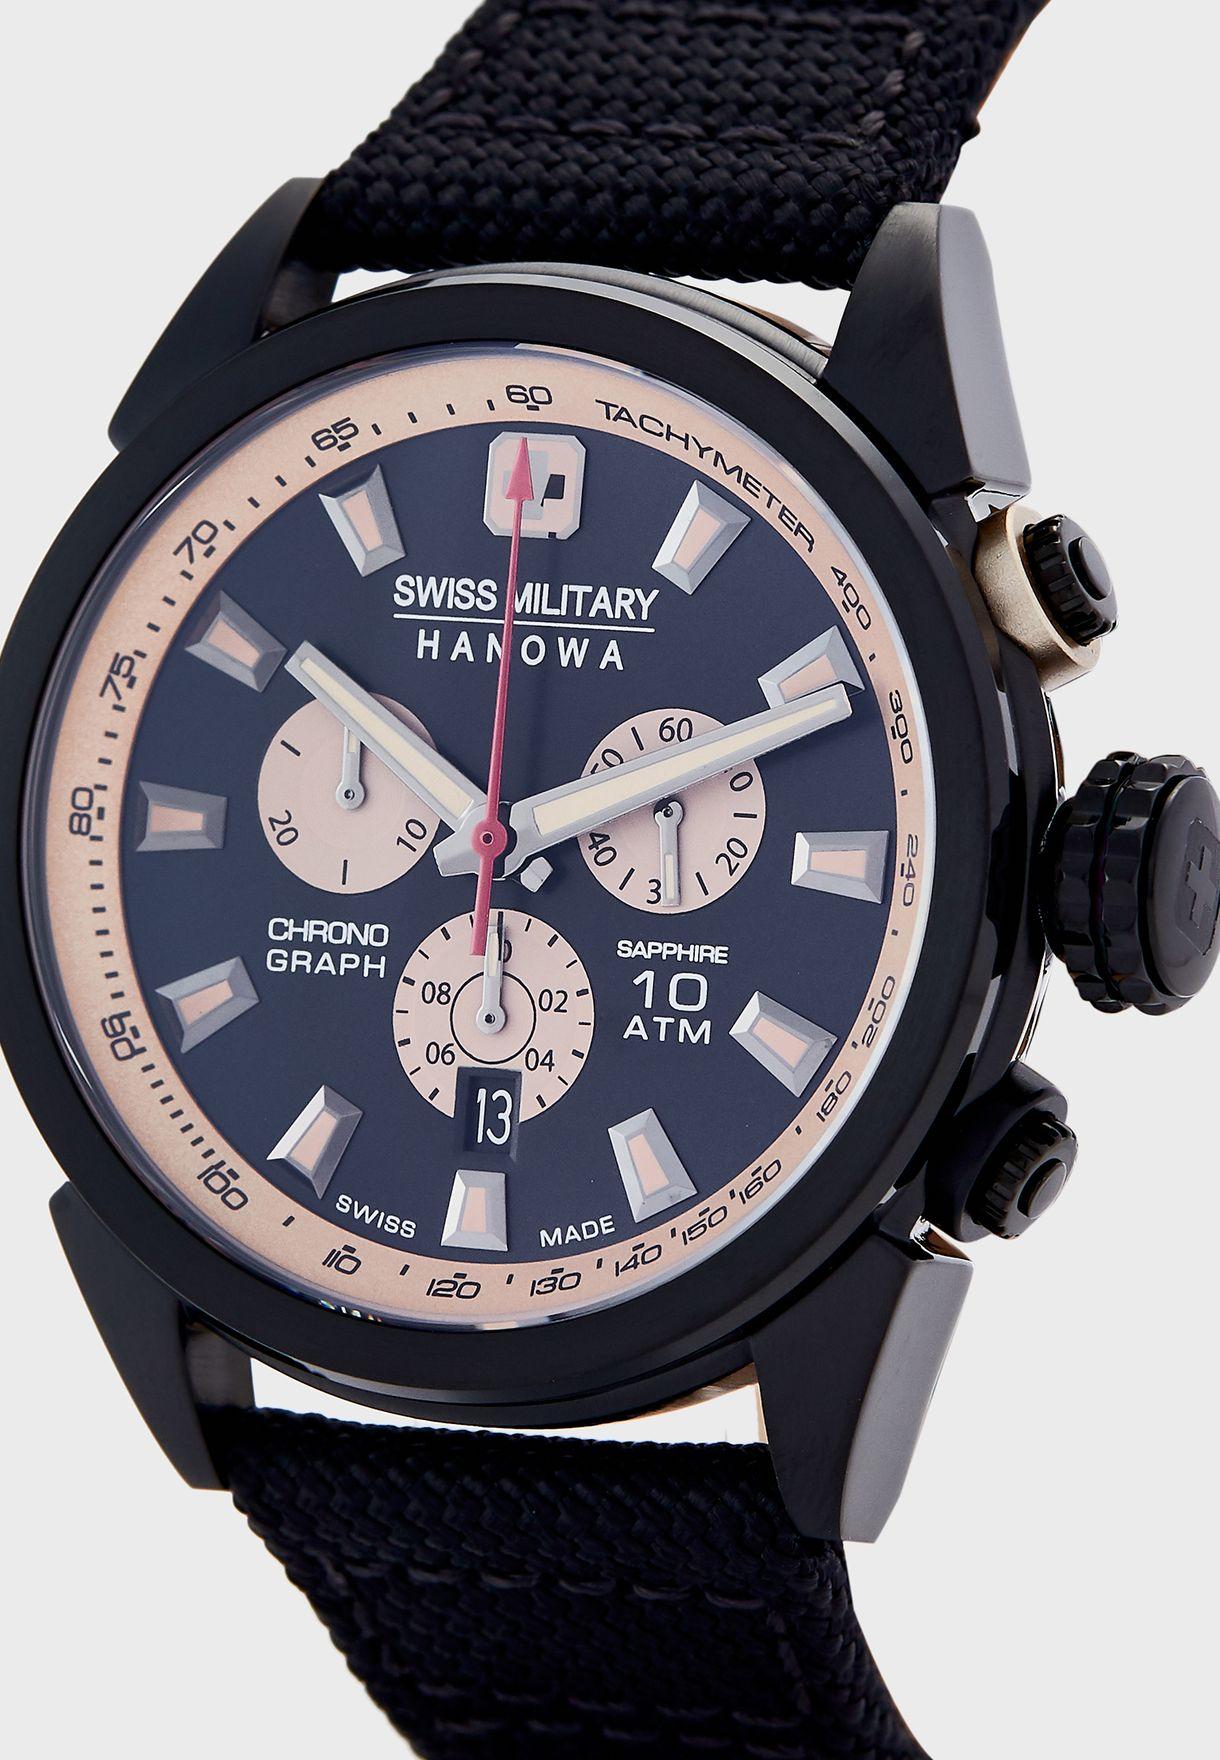 W S6-43221300714 Platoon Chronograph Watch